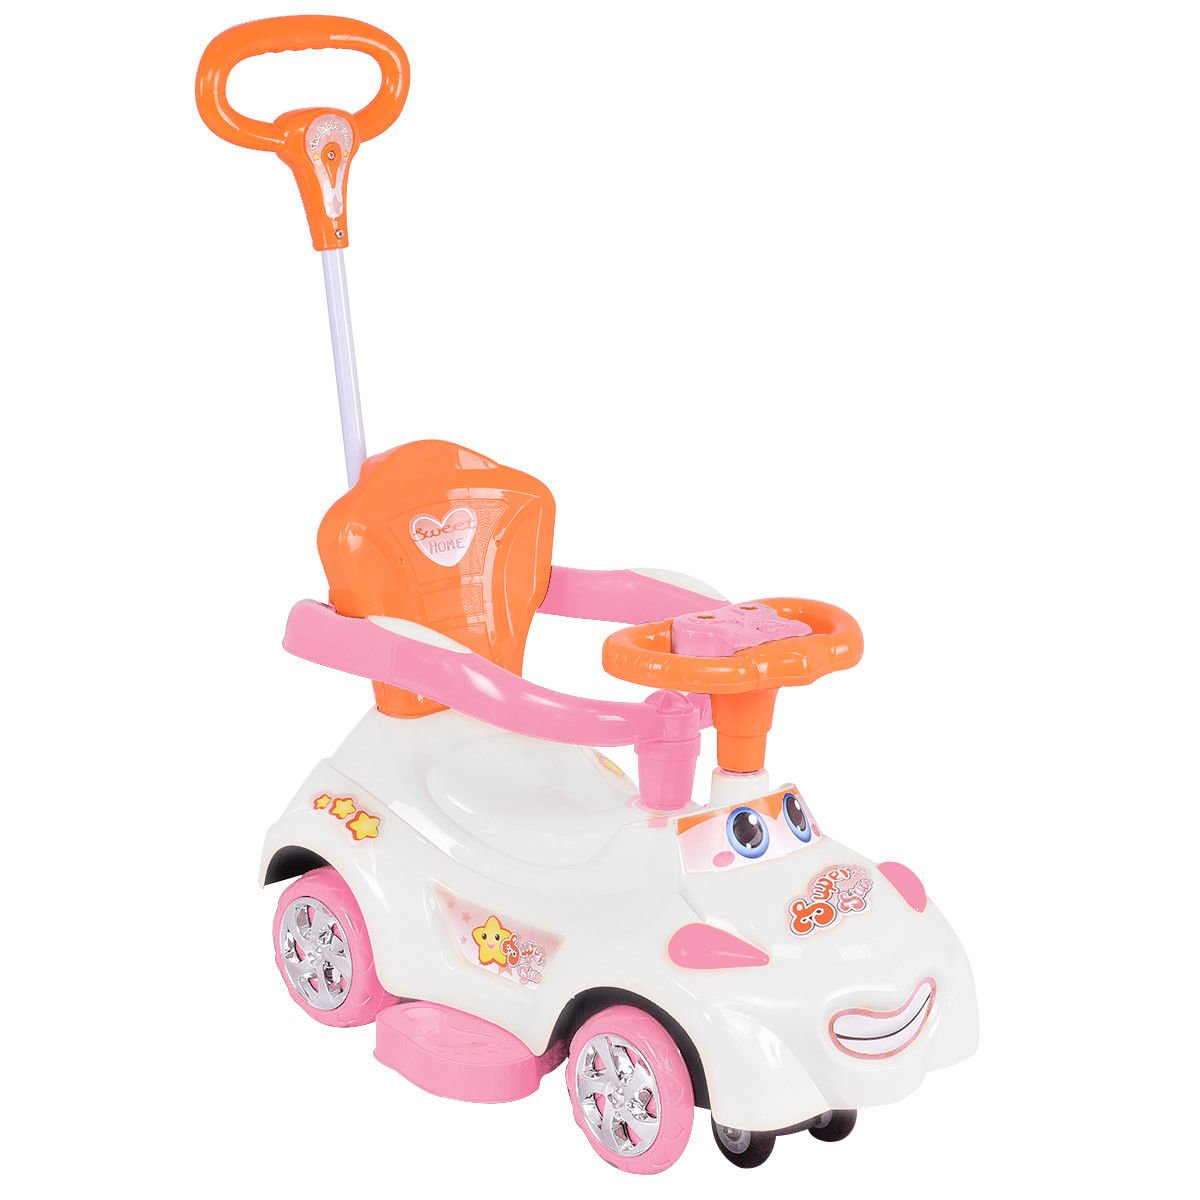 Costzon Kids Ride On Push Car, 3 in 1 Sliding Swinging Wagon w/ Handle Music (White)